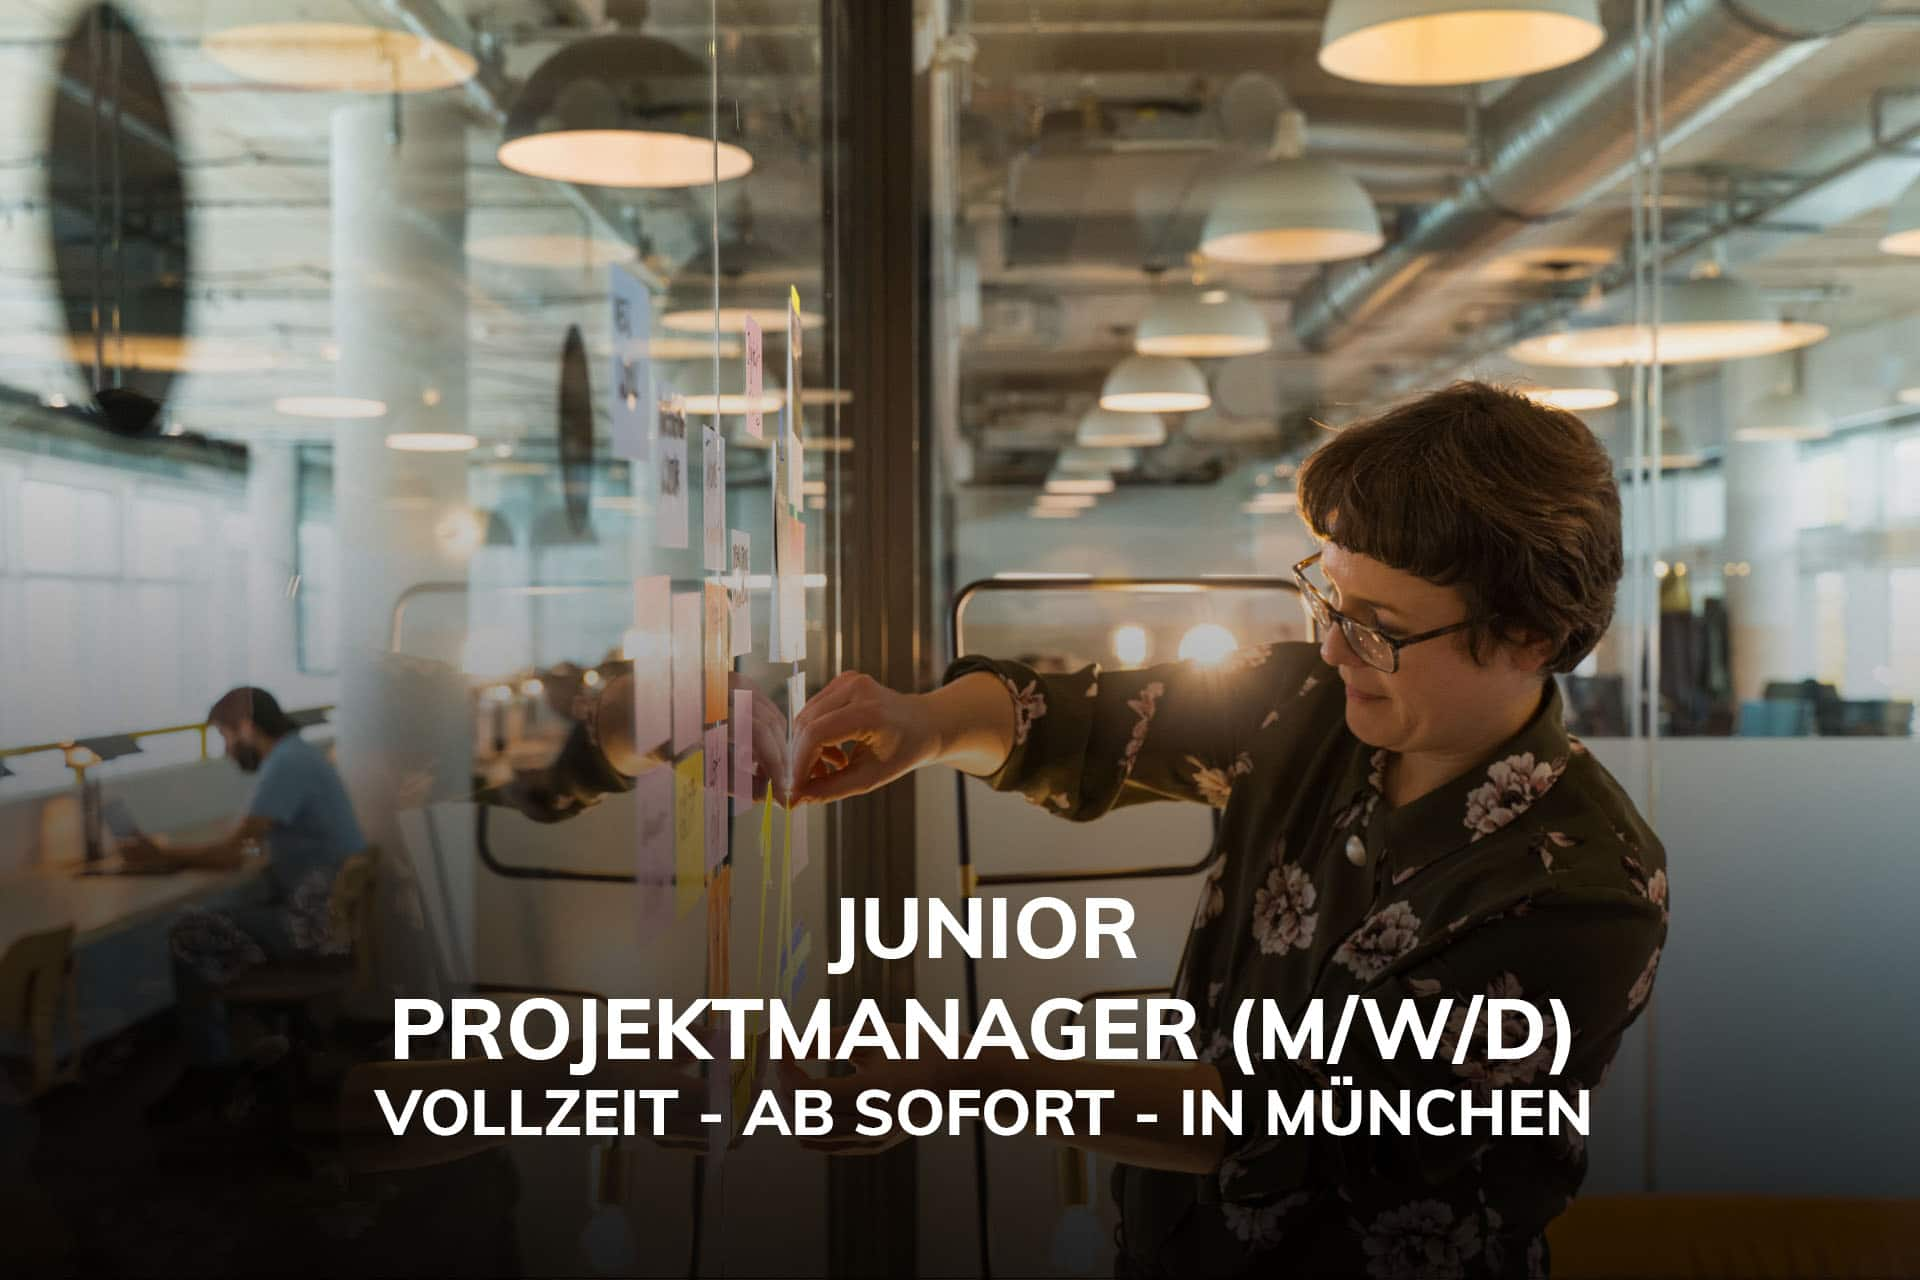 Junior Projektmanager Berg & Macher